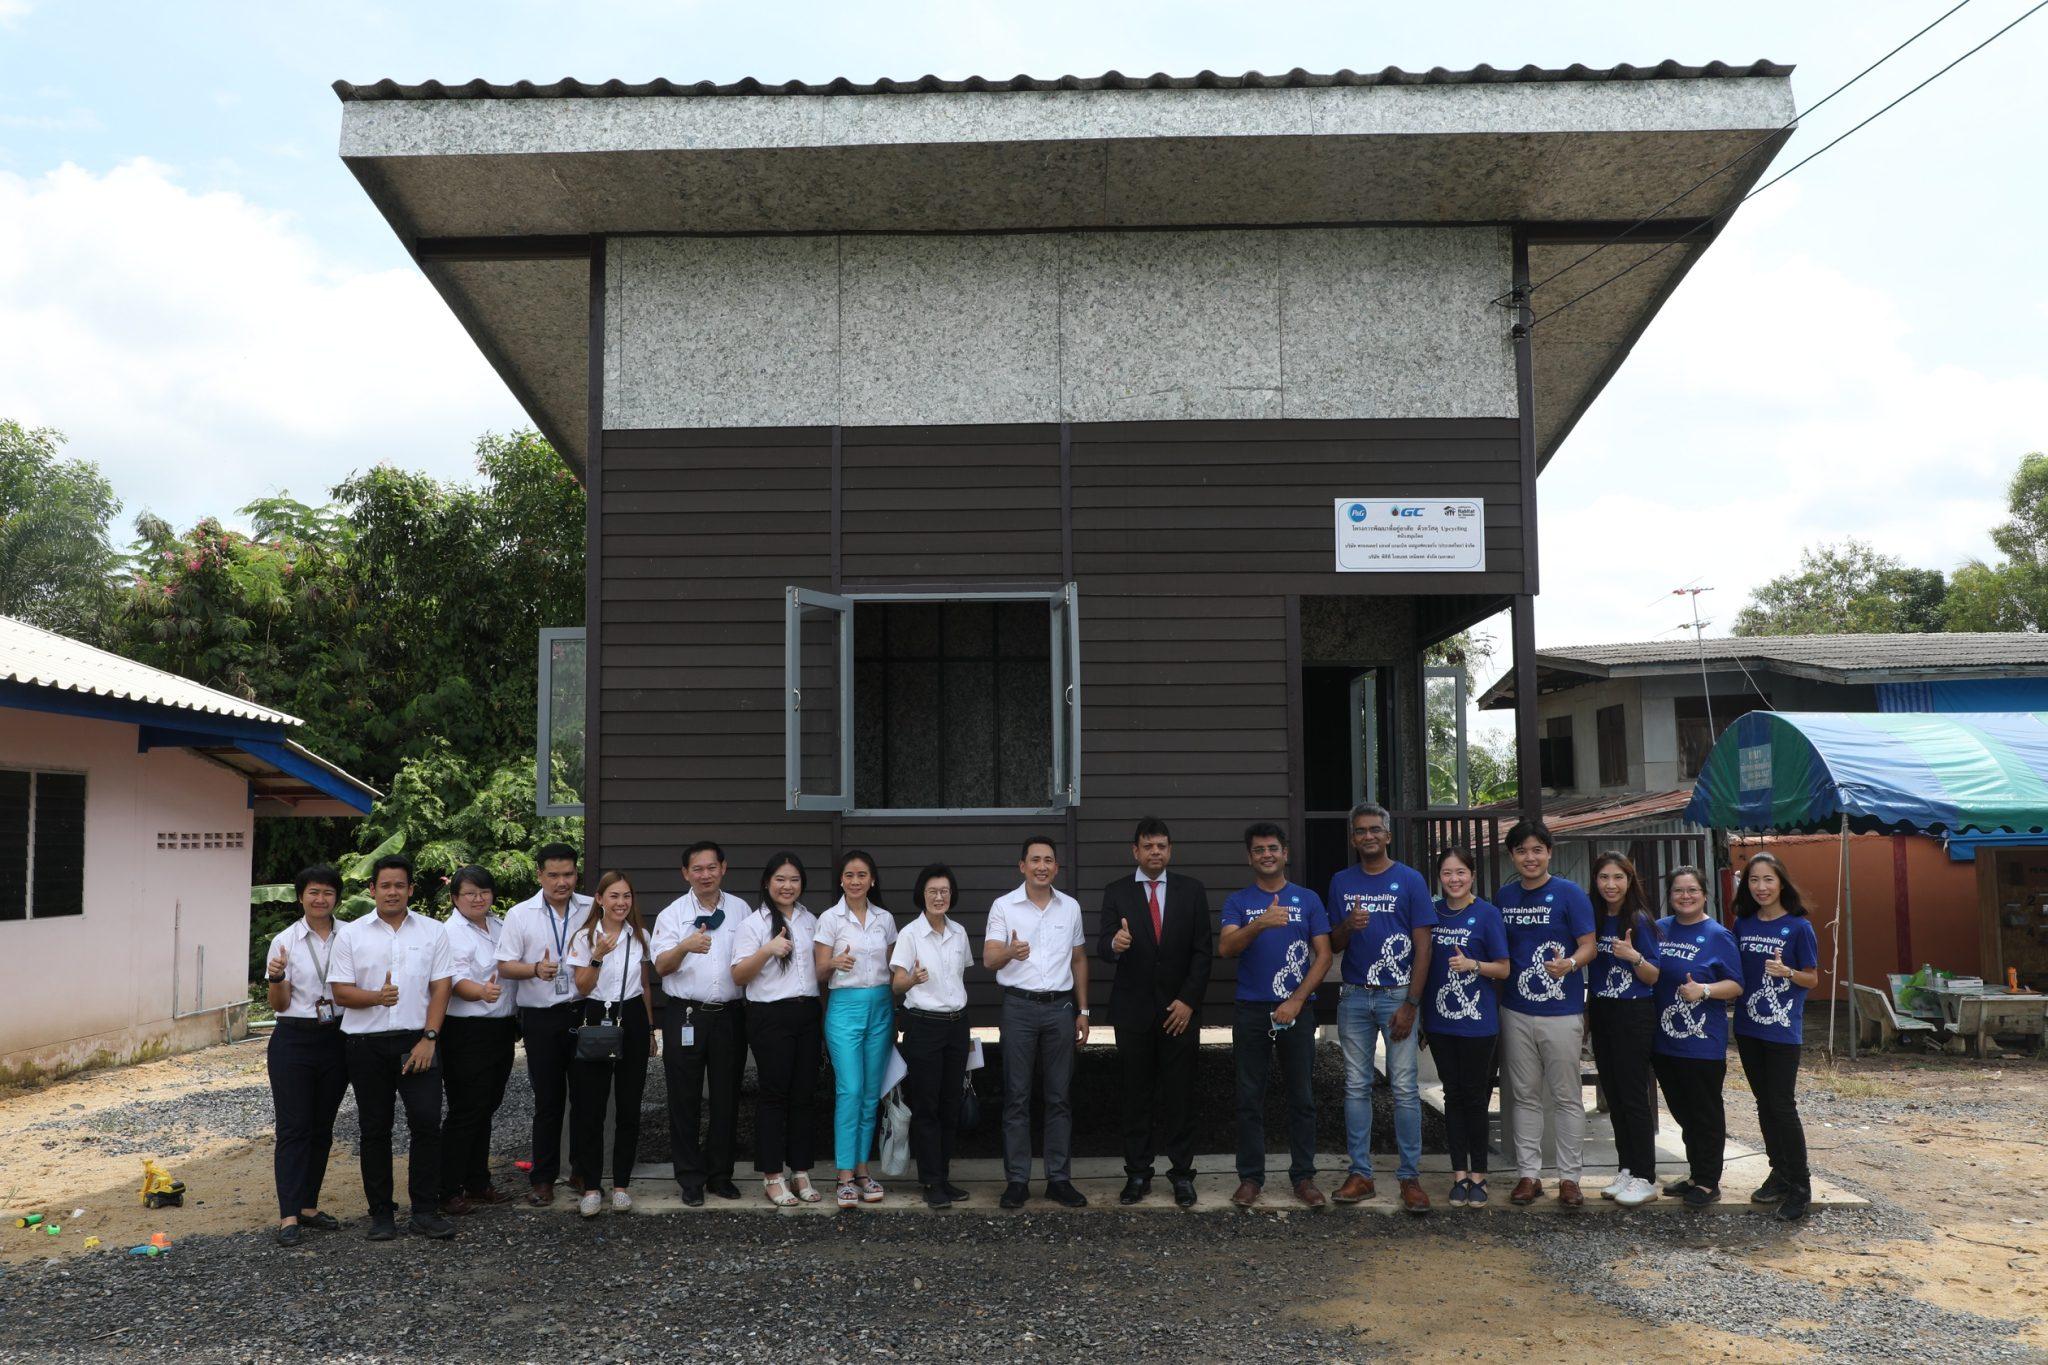 P&G Thailand จับมือ GC และ Habitat for Humanity สร้างบ้านจากวัสดุ Upcycling หลังแรกของไทย